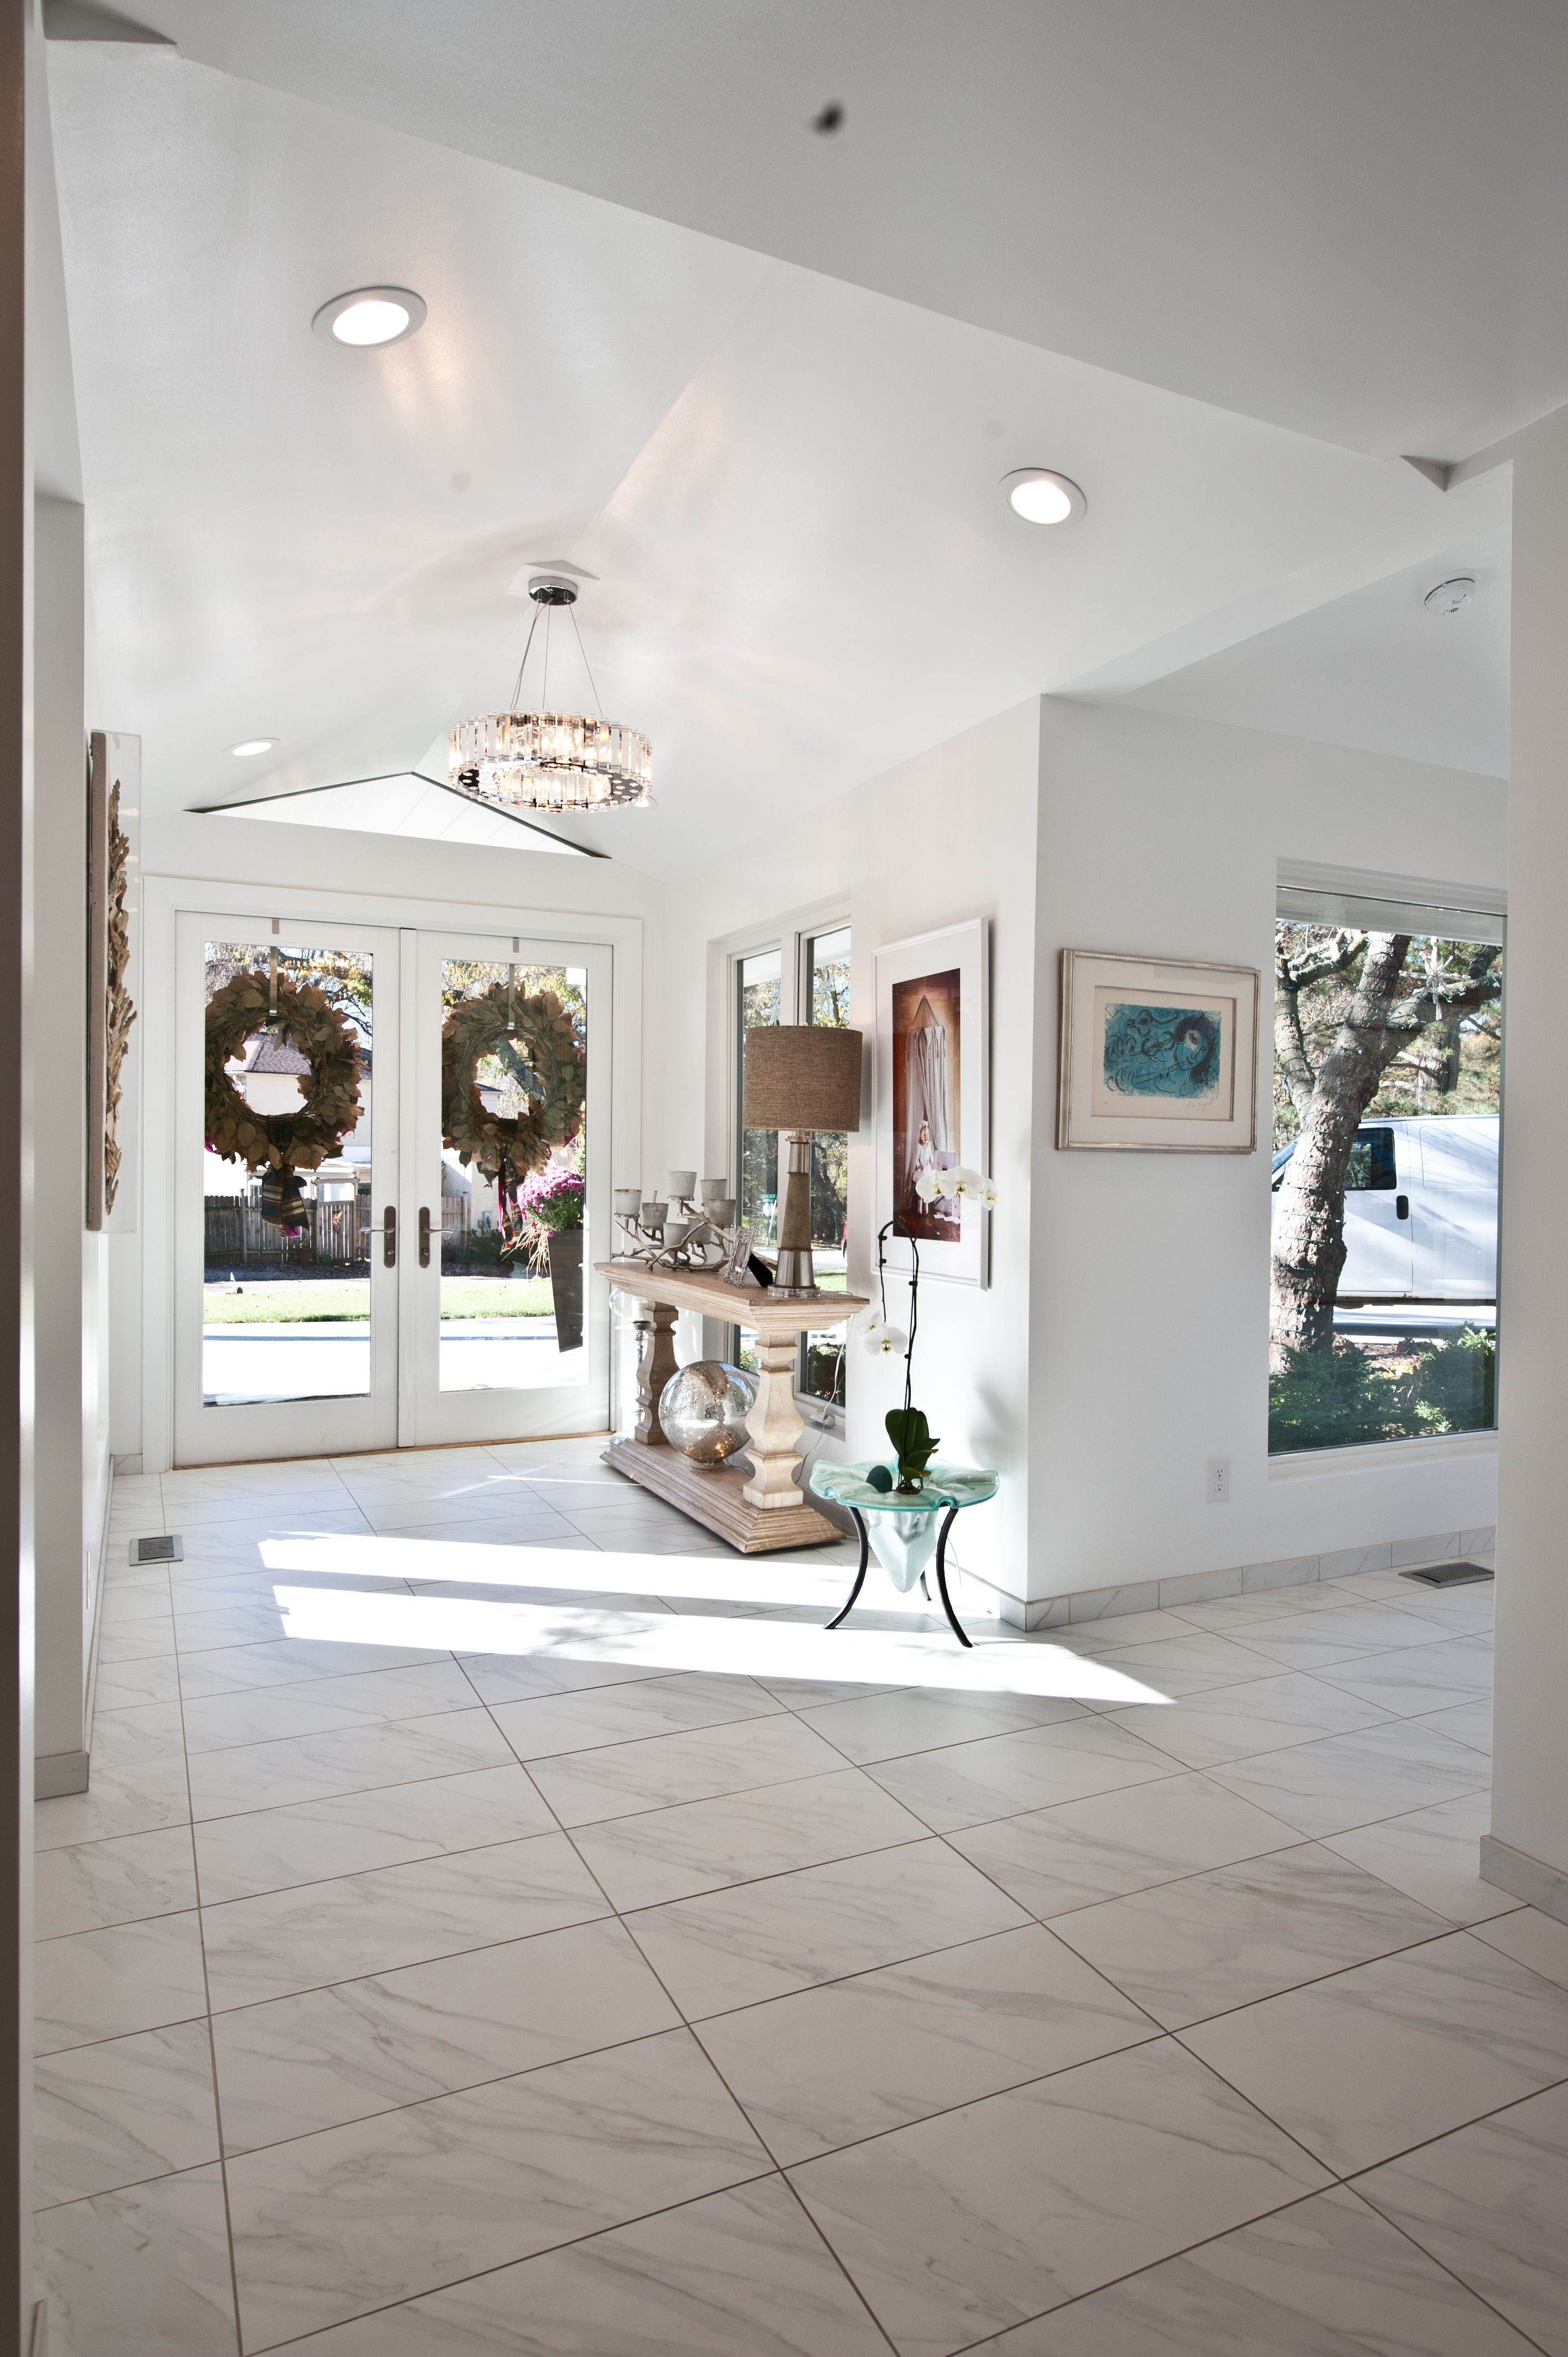 Finishes by Rainwood Interiors interiordesign Floors Pinterest